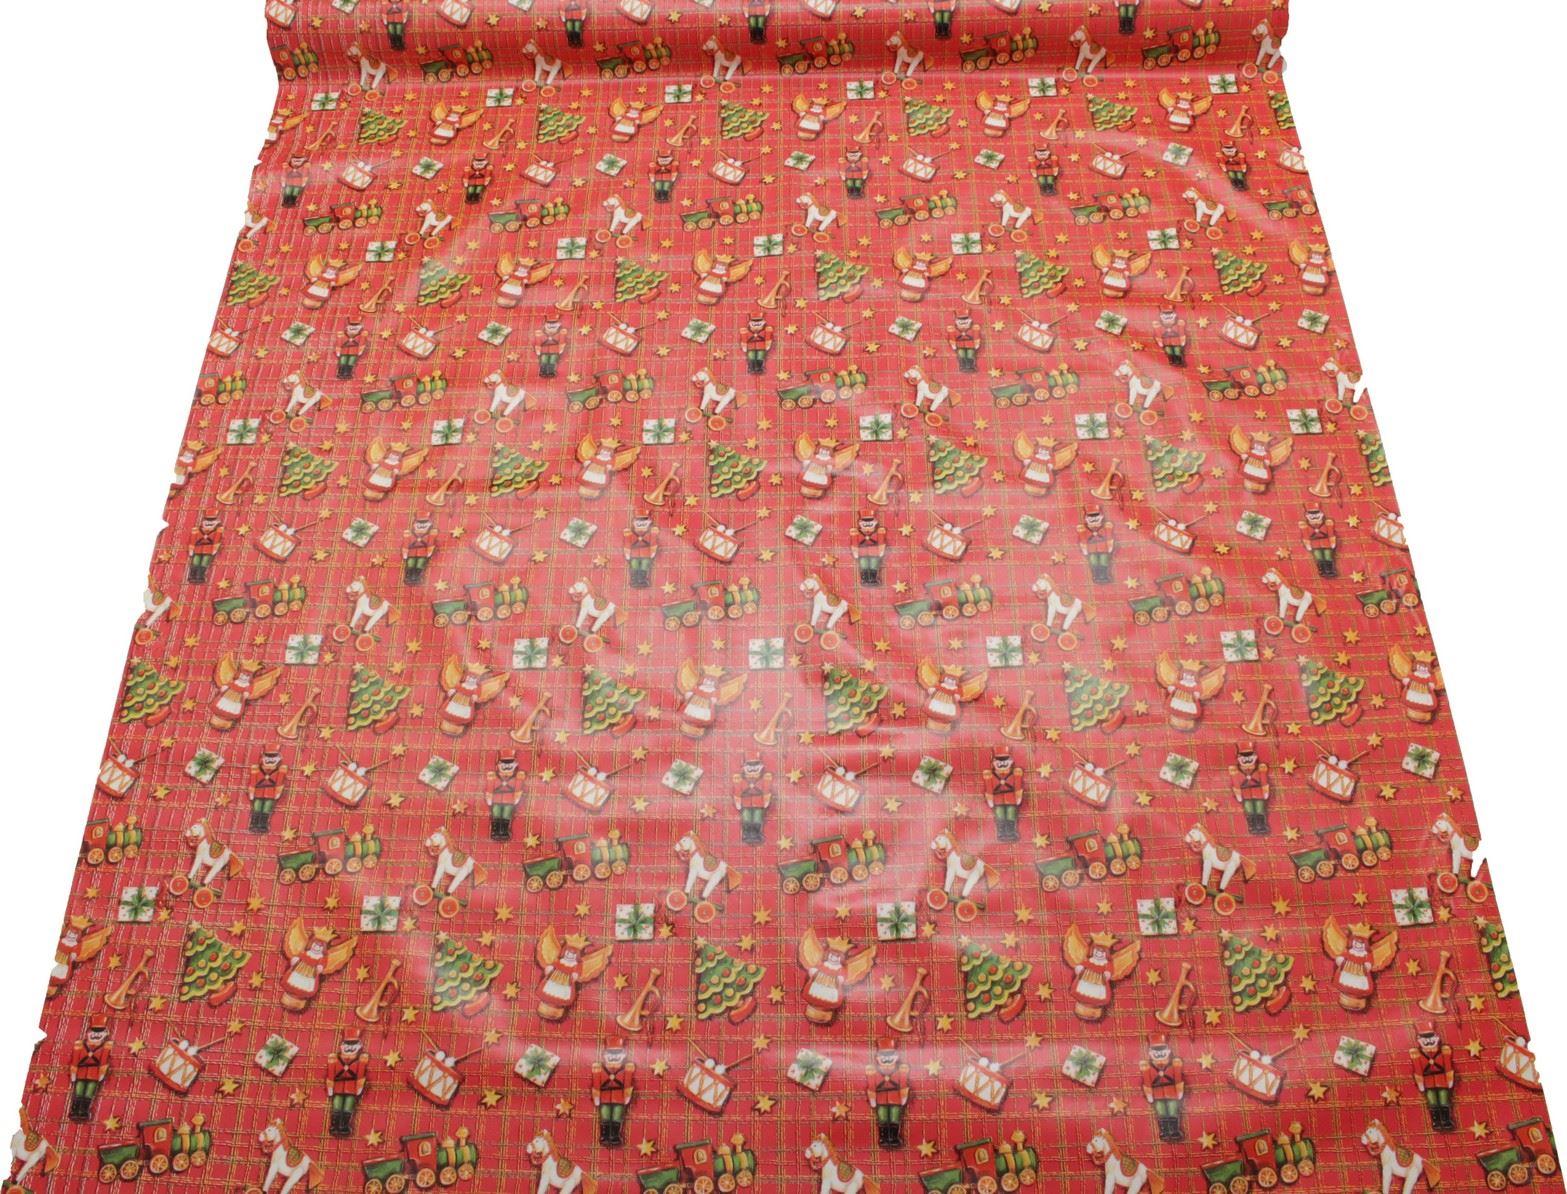 thumbnail 37 - CHRISTMAS PVC OILCLOTH VINYL FABRIC XMAS KITCHEN TABLE WIPECLEAN TABLECLOTHS